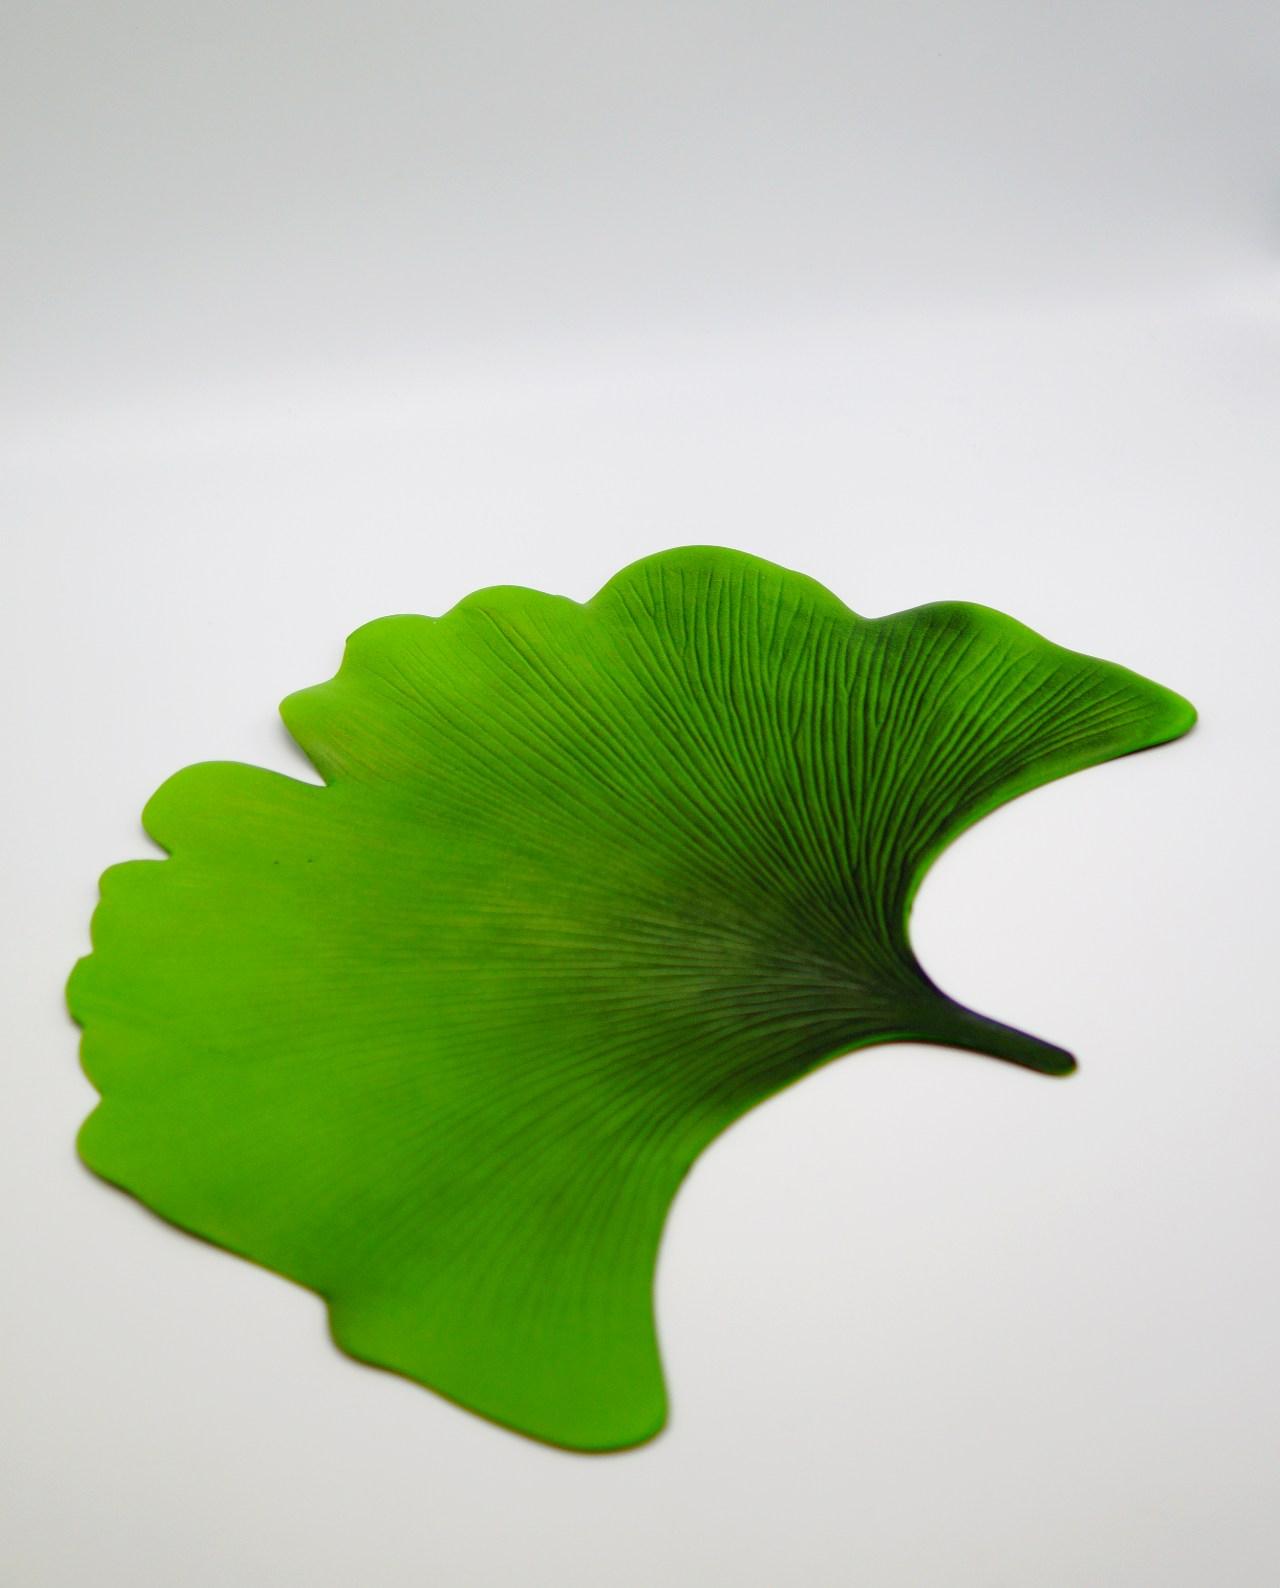 Decorative Placemat Lotus Leaf